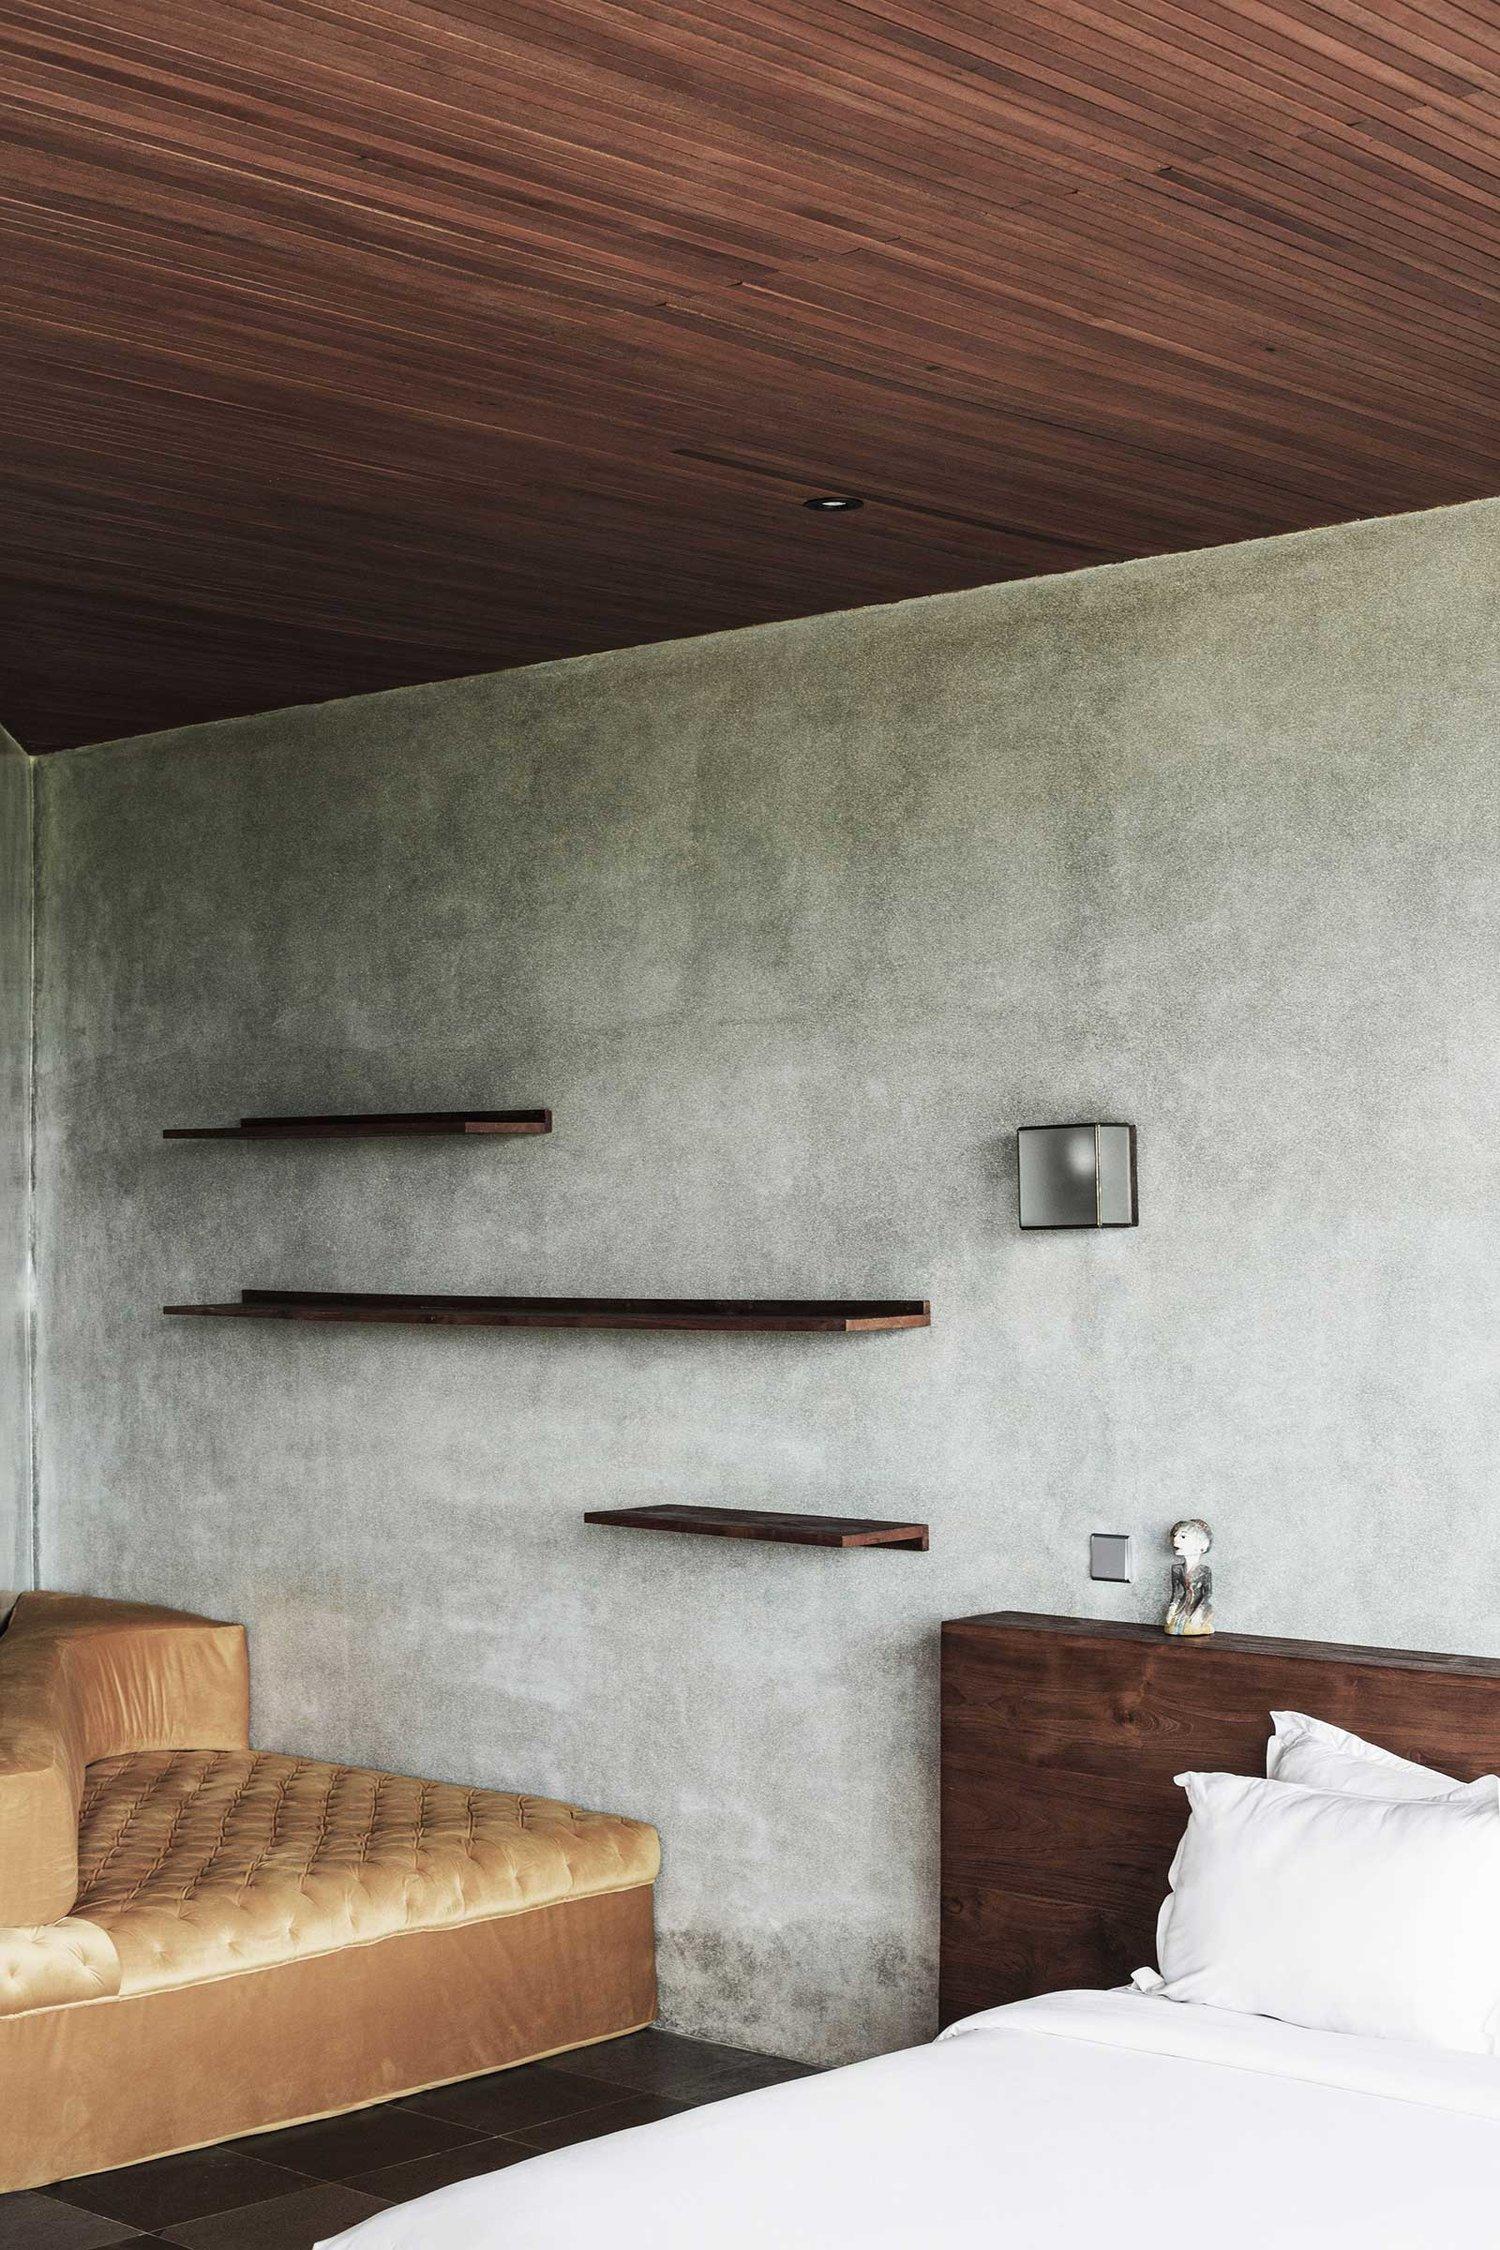 bali / architect alexis dornier